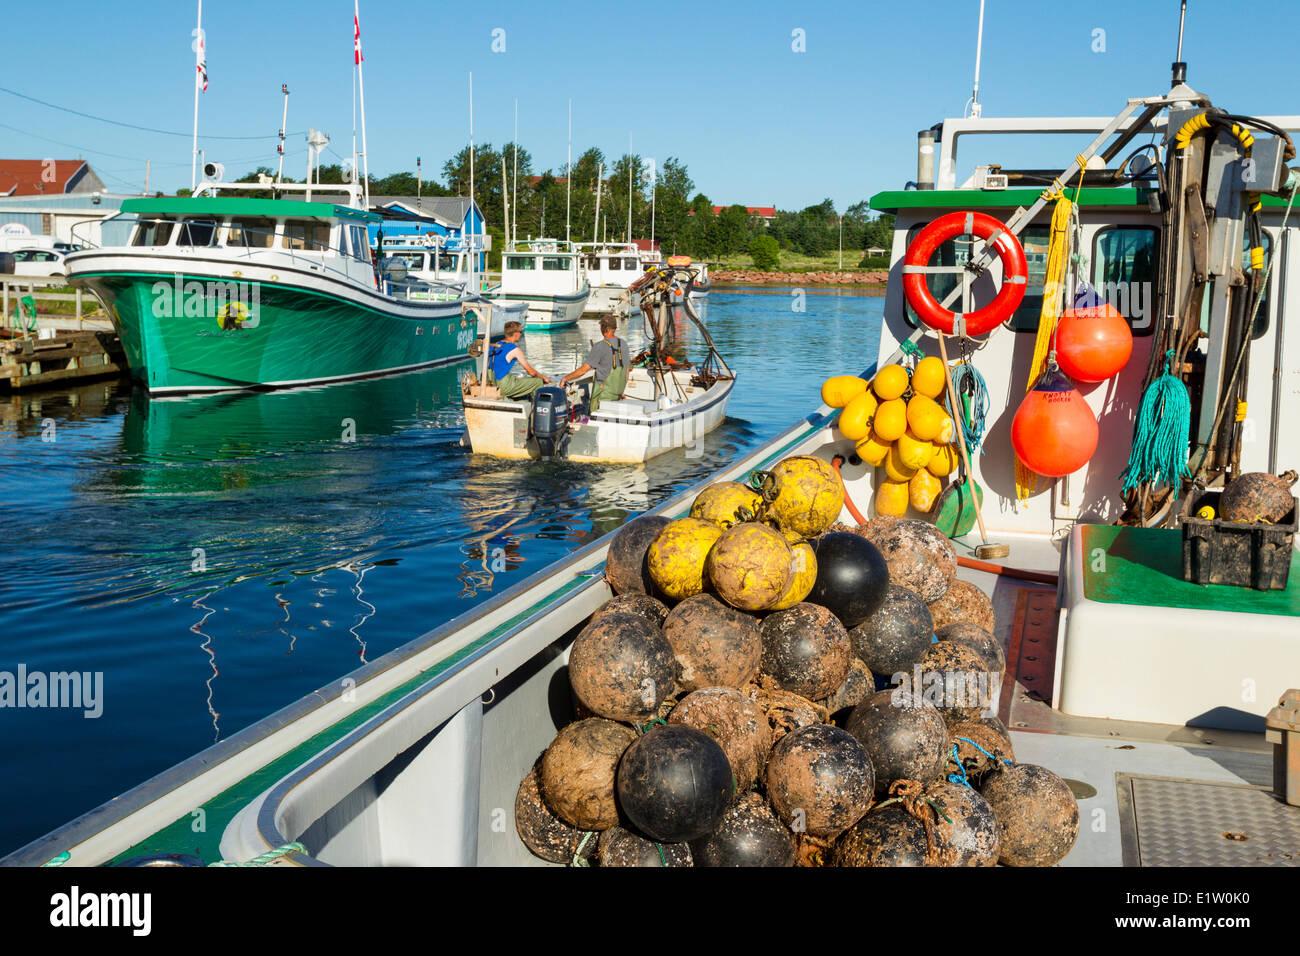 Fishing boats, Stanley Bridge Wharf, Prince Edward Island, Canada - Stock Image